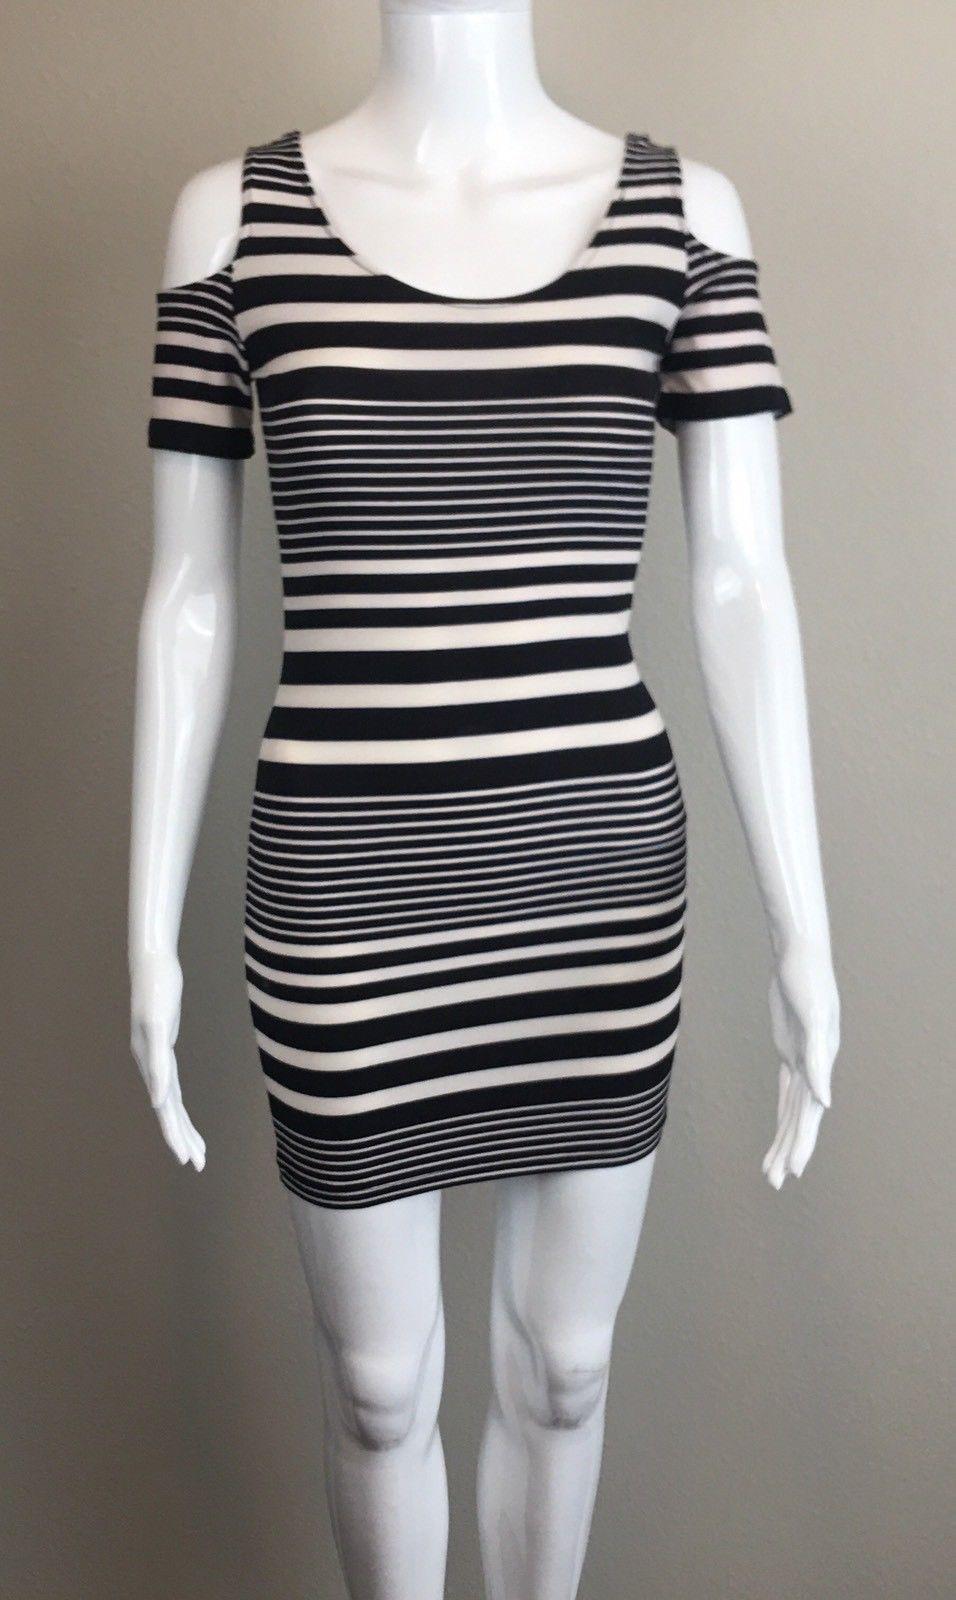 Cool amazing planet gold macyus striped coldshoulder bodycon dress